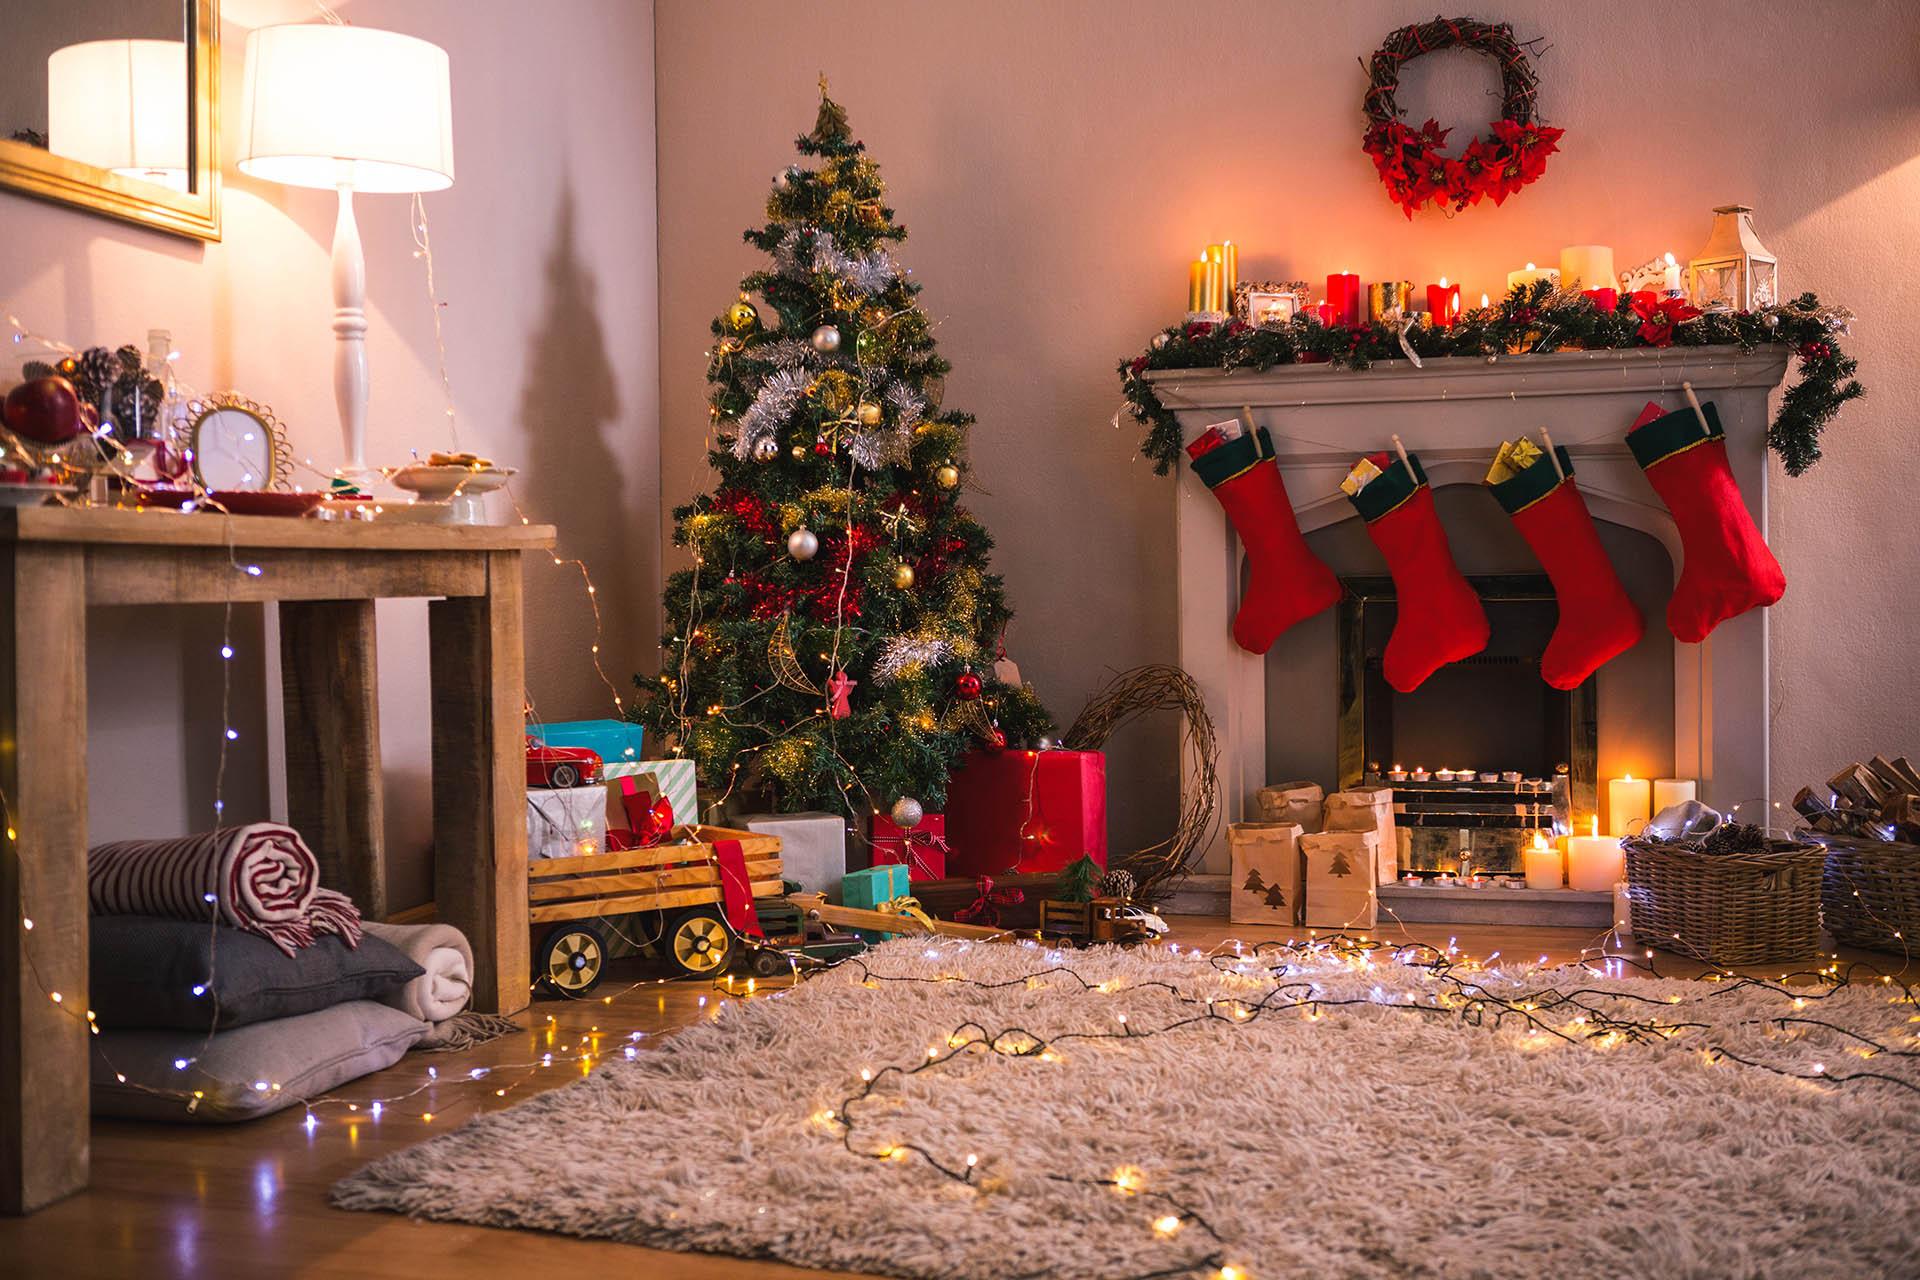 Foto de Navidad creado por awesomecontent - www.freepik.es